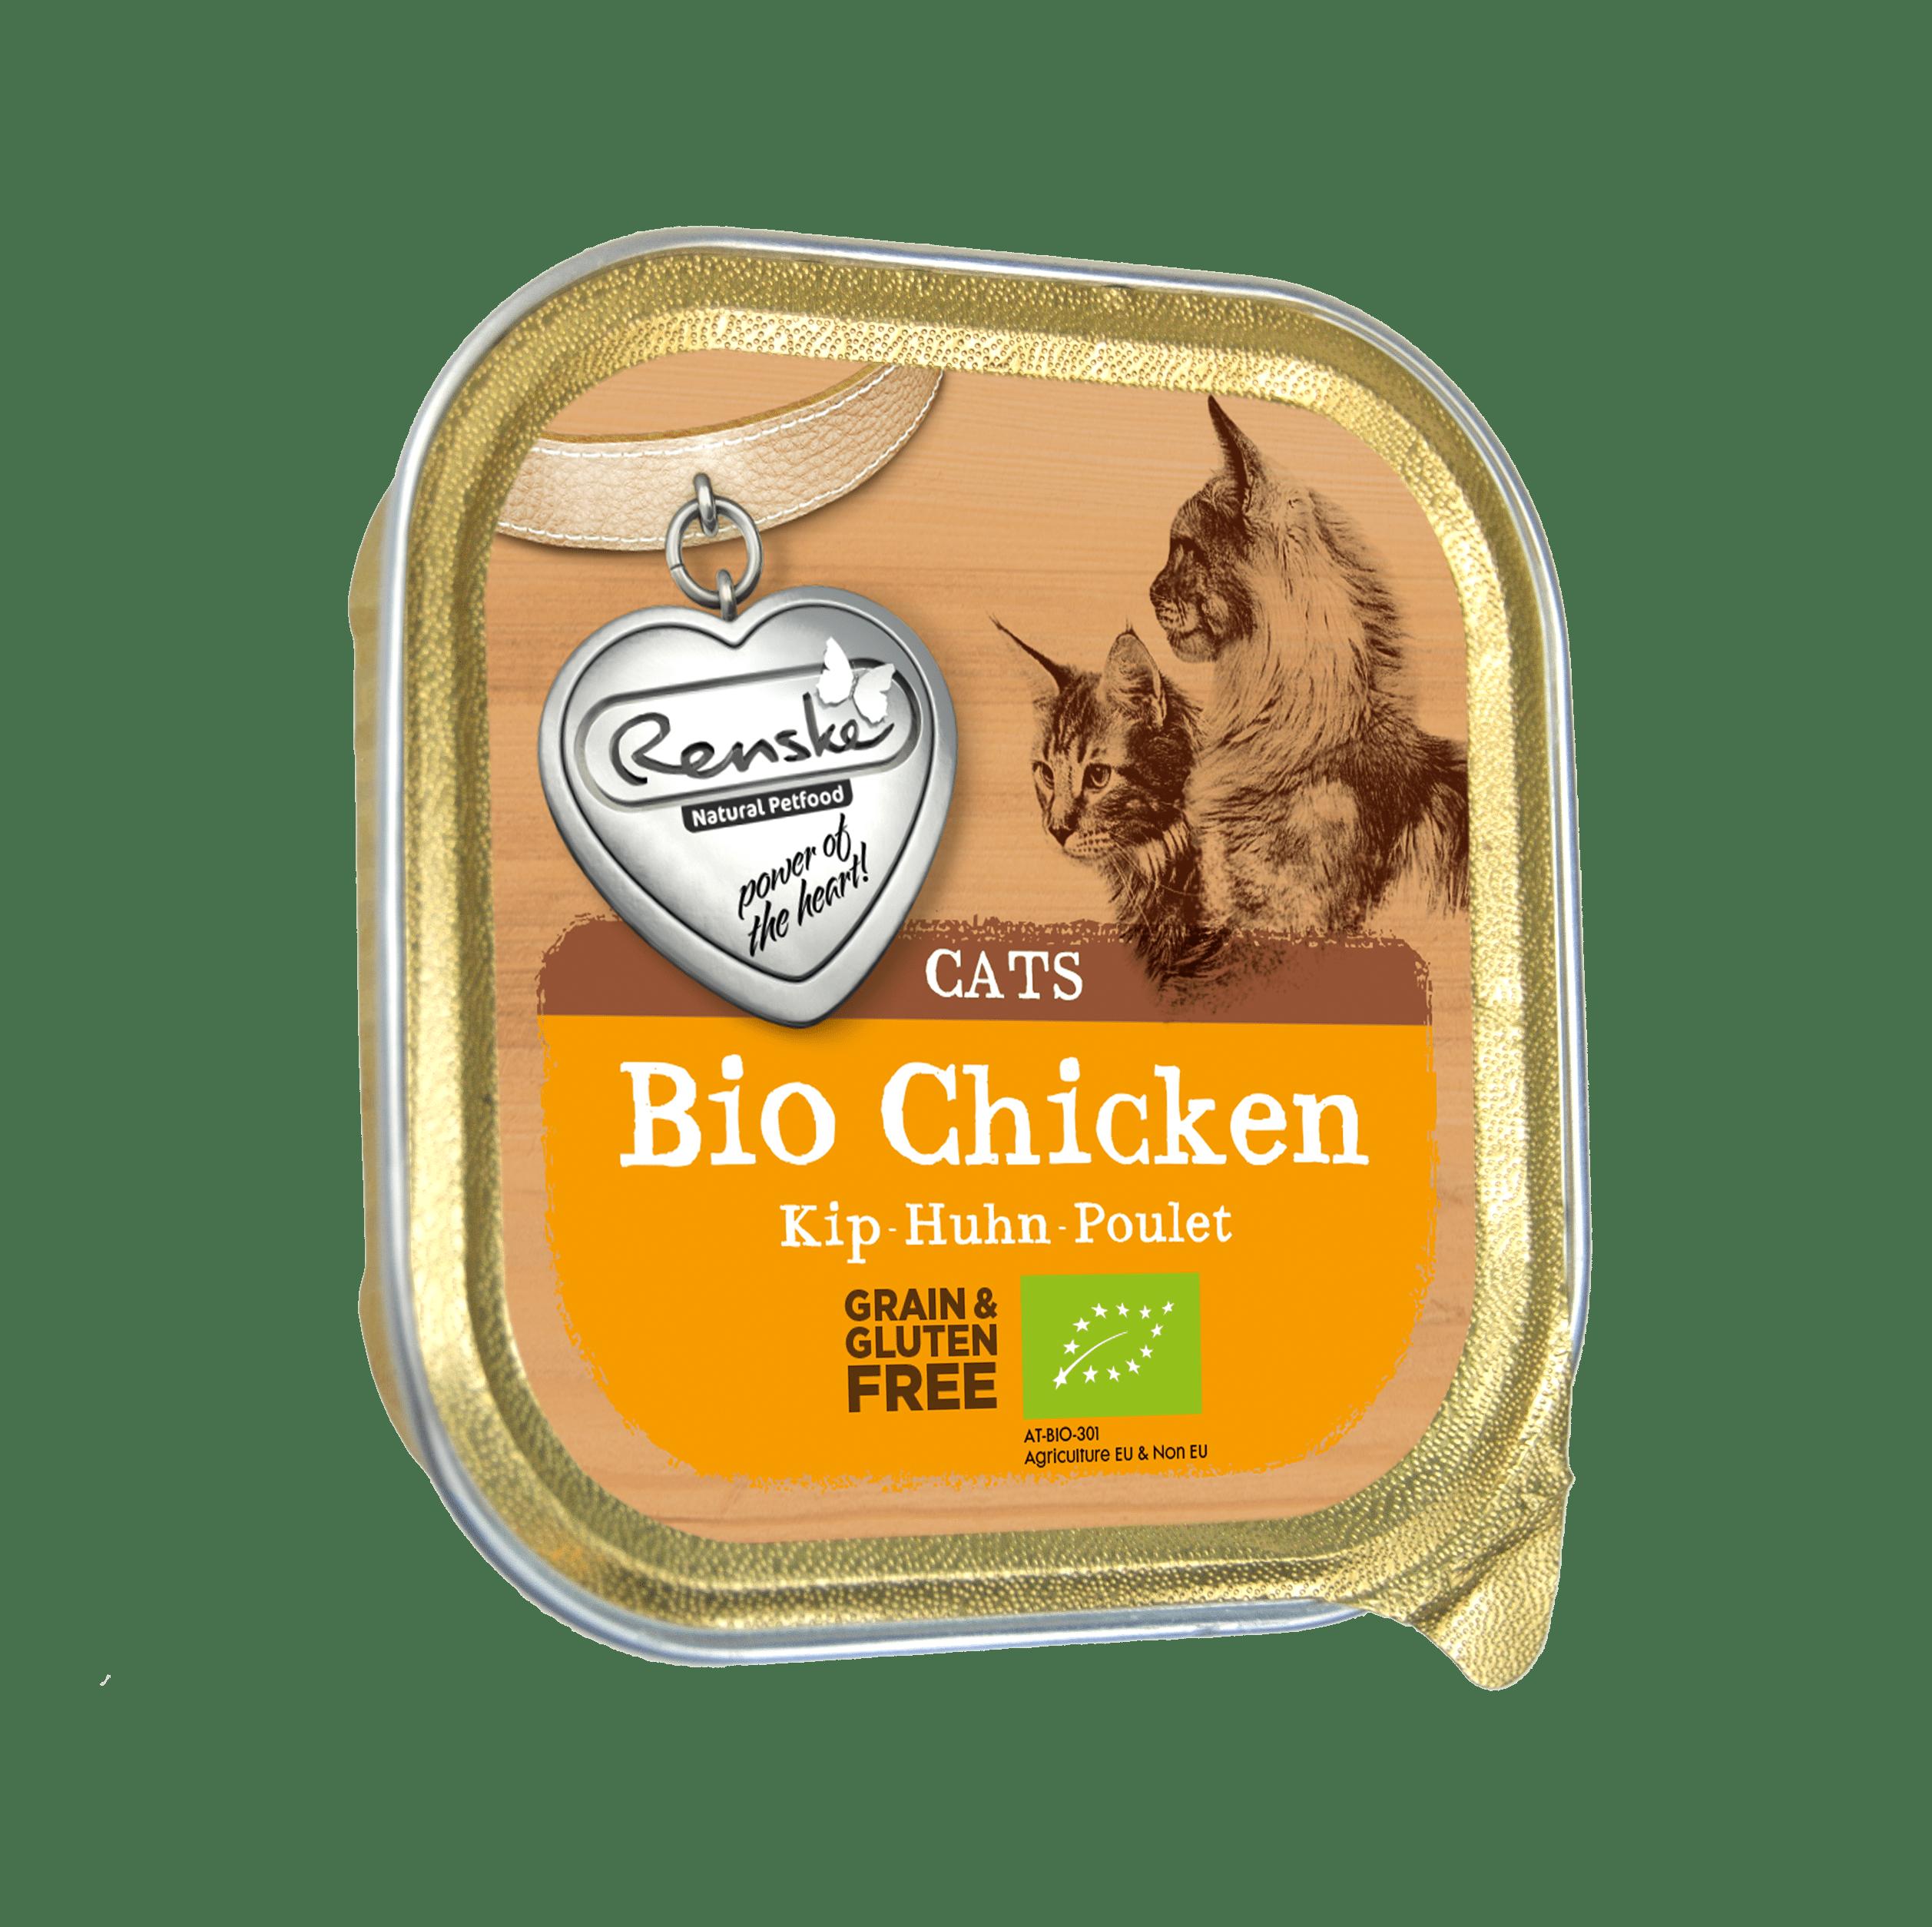 renske-organic-chicken-85g_optimized